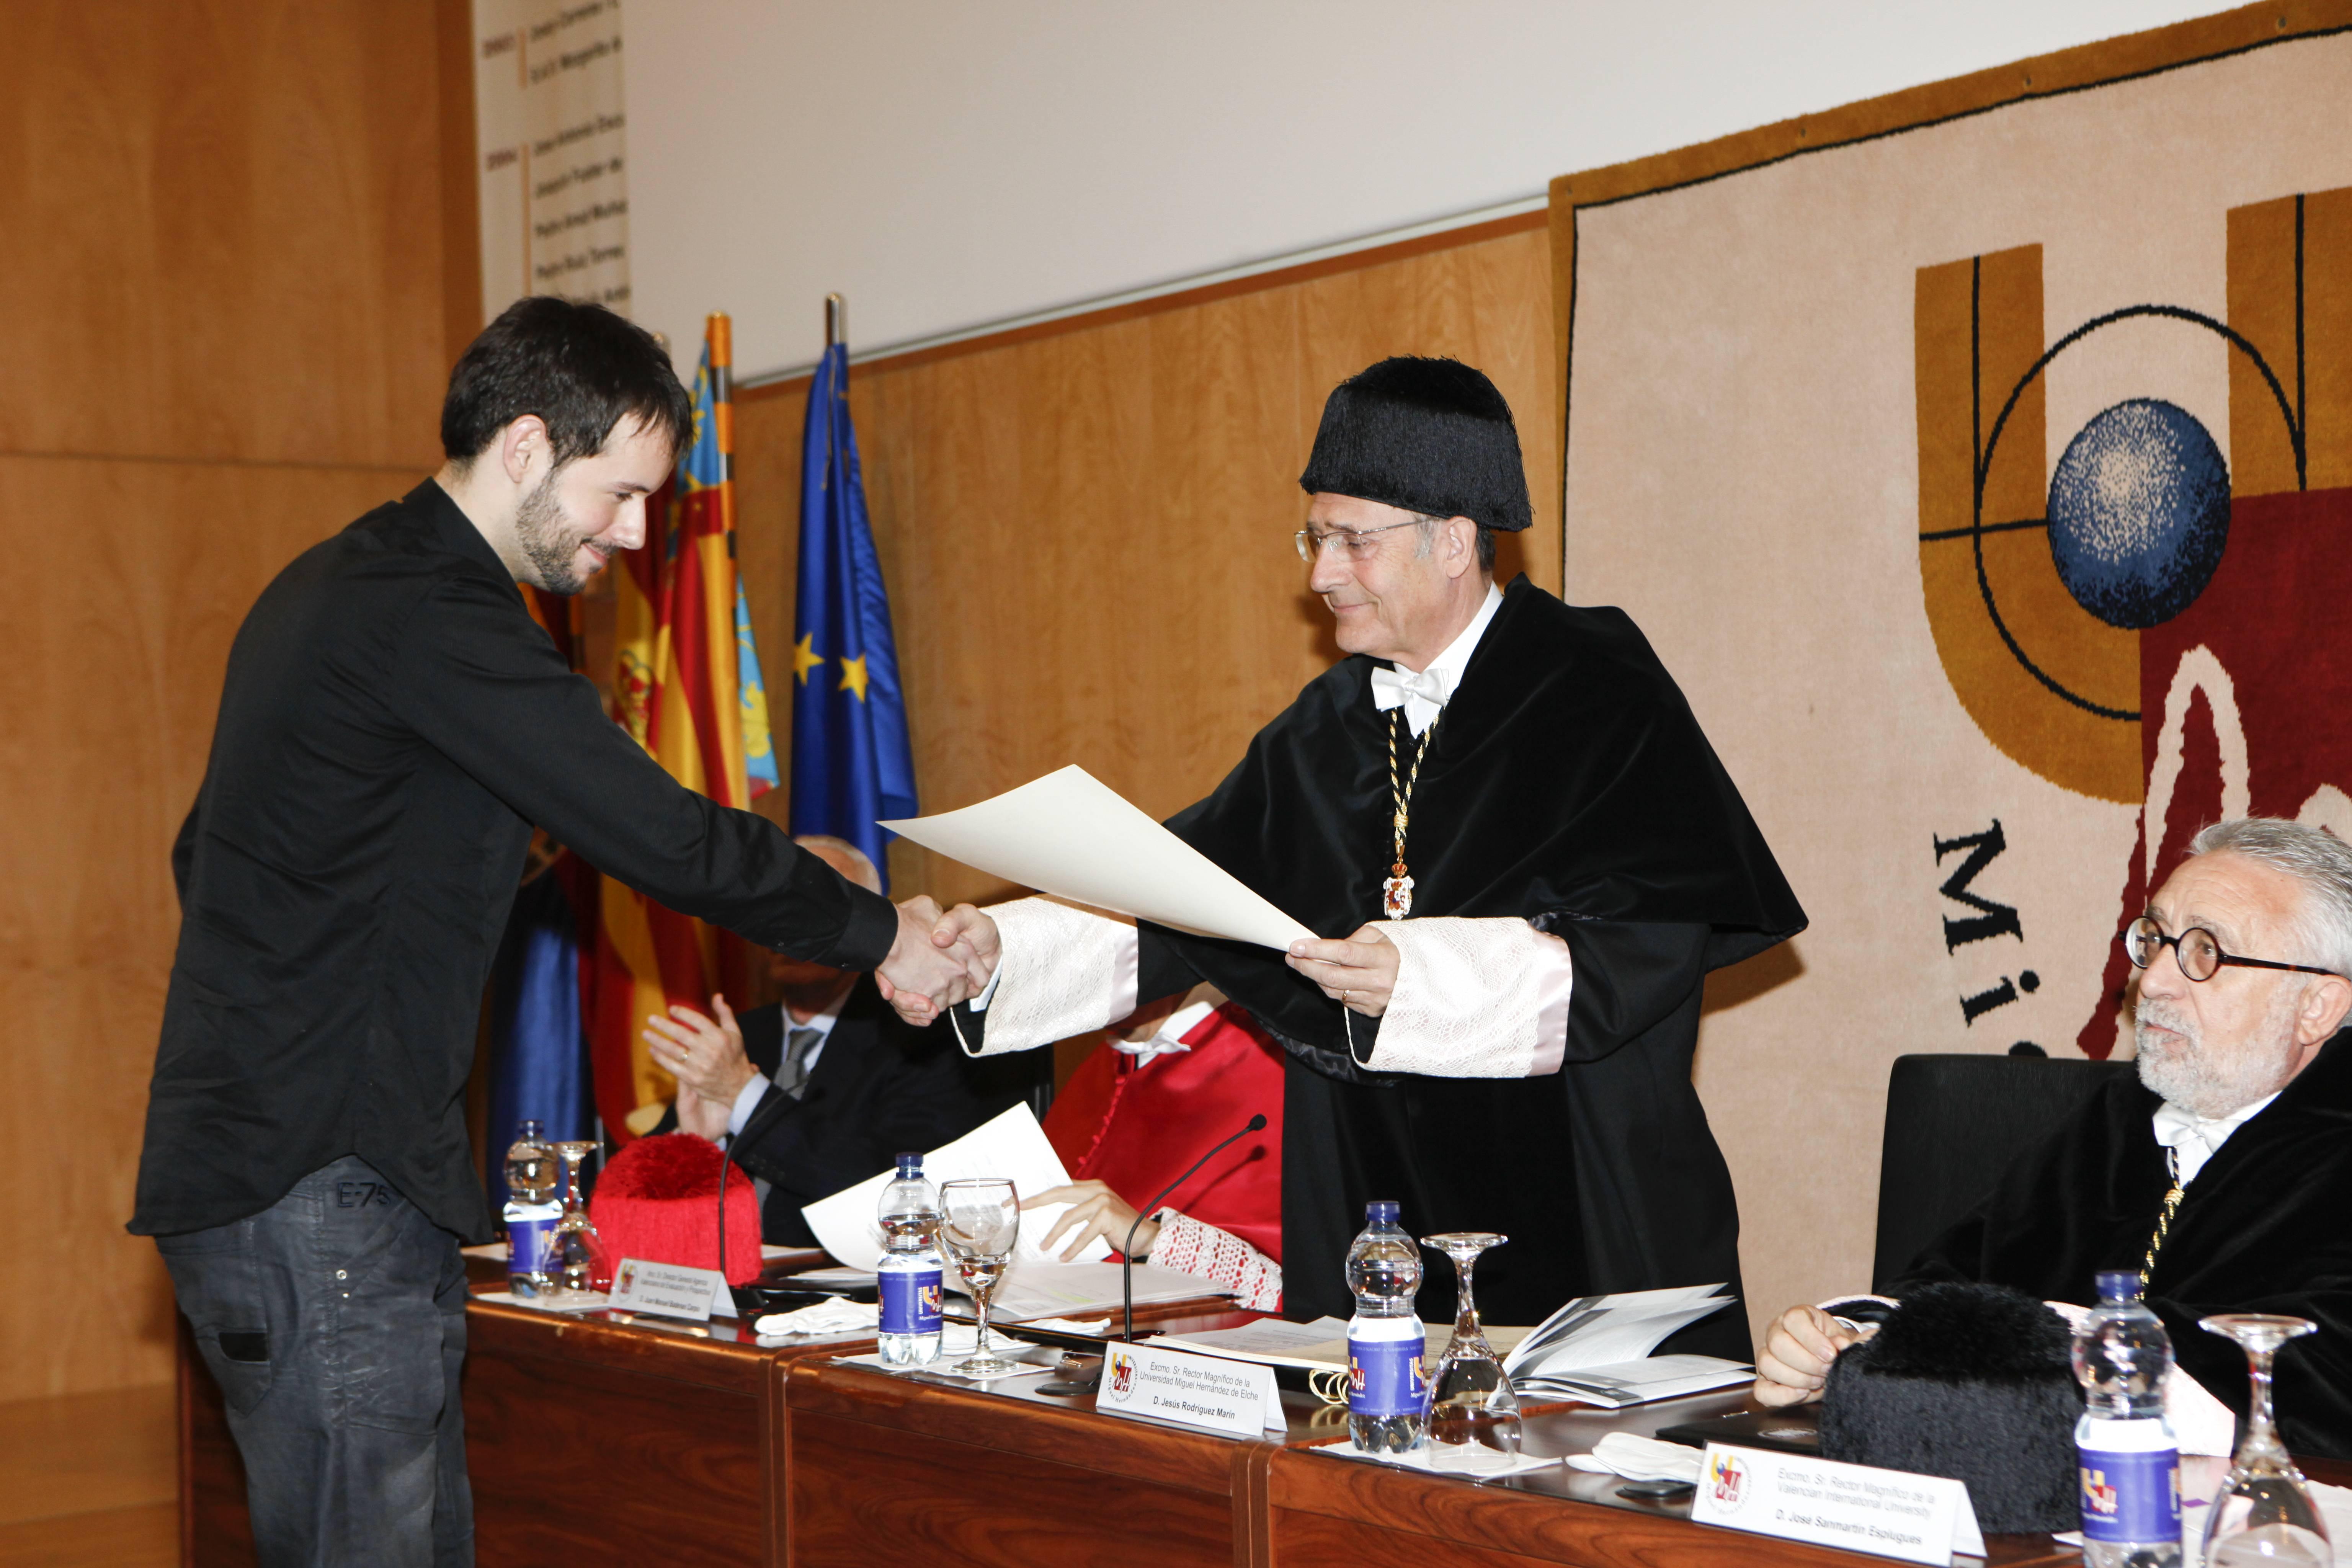 doctor-honoris-causa-luis-gamir_mg_0894.jpg